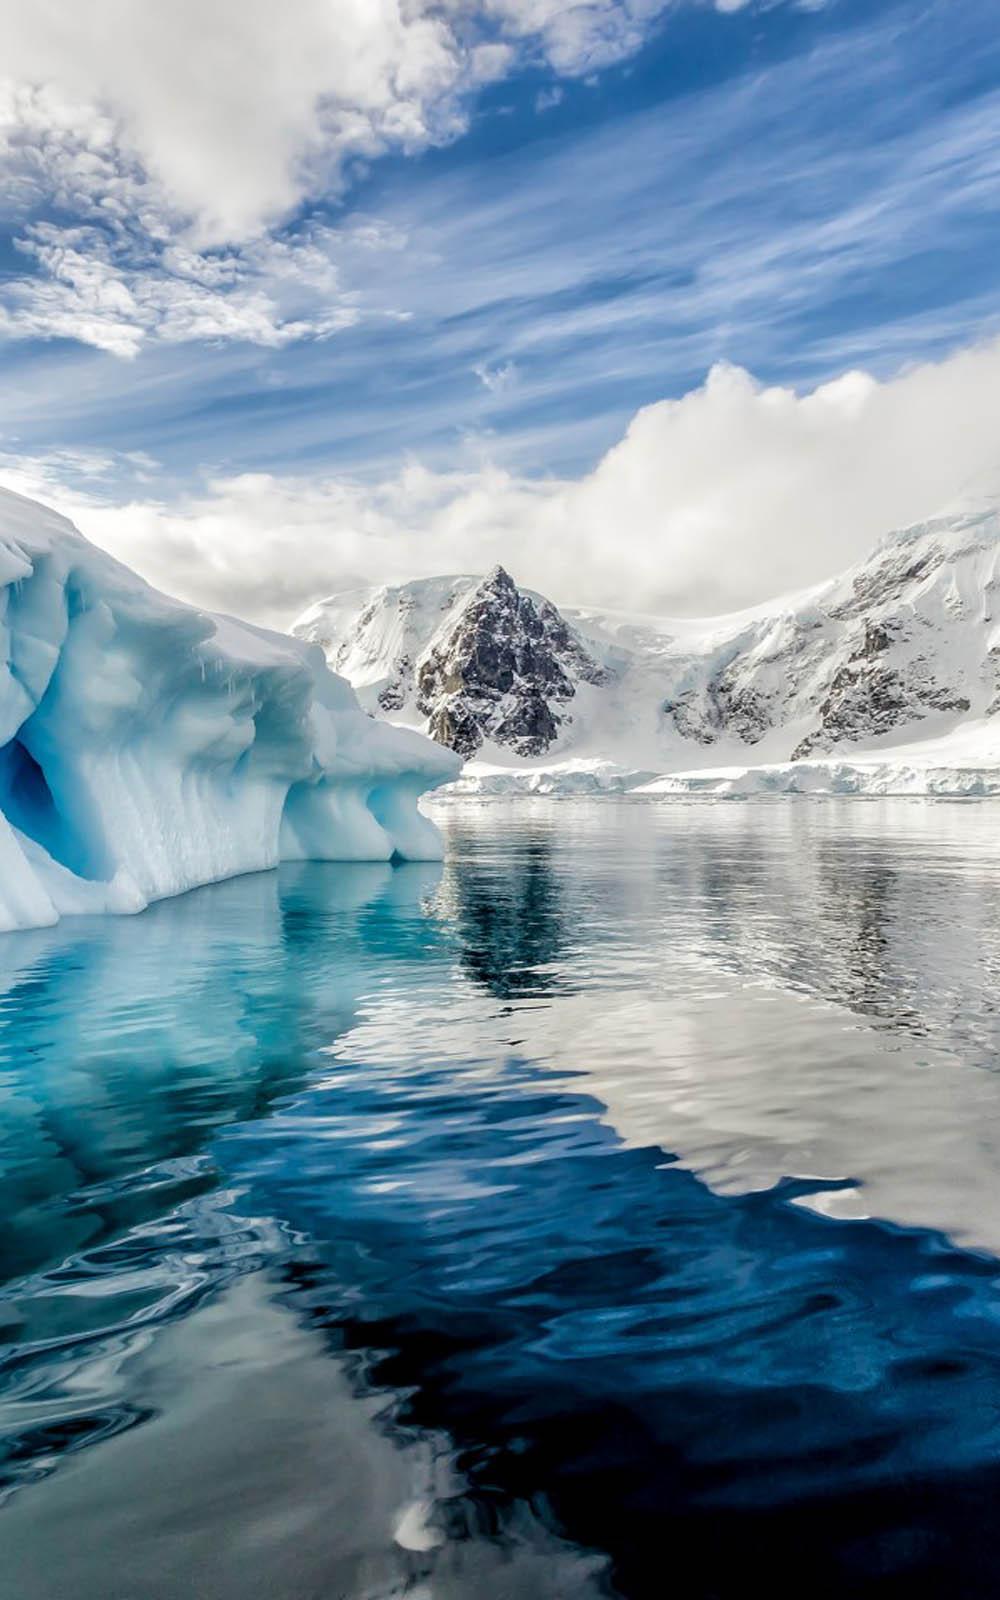 Anime Girl Bike Wallpaper Download Antarctica Iceberg Ocean Free Pure 4k Ultra Hd